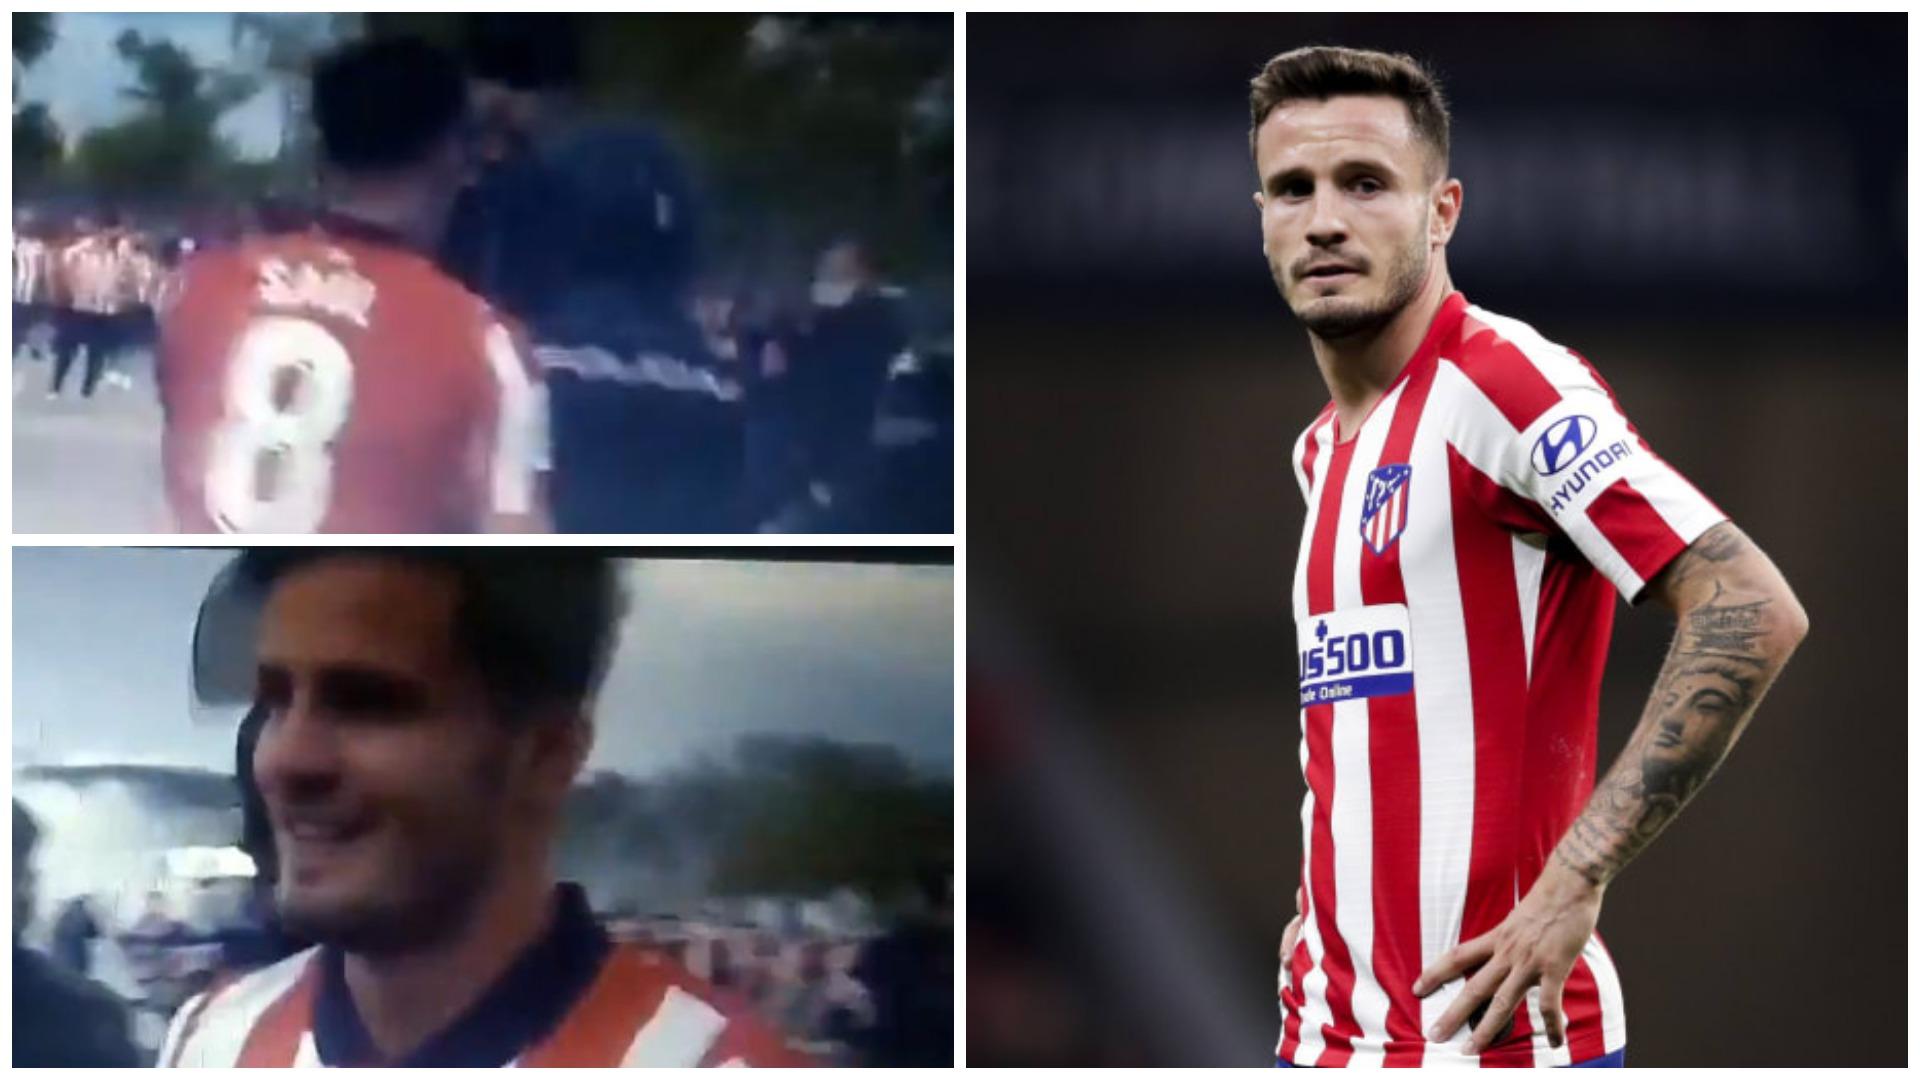 VIDEO/ Forcat speciale gati ta zhdëpnin, Saul shpëton tifozin e Atleticos